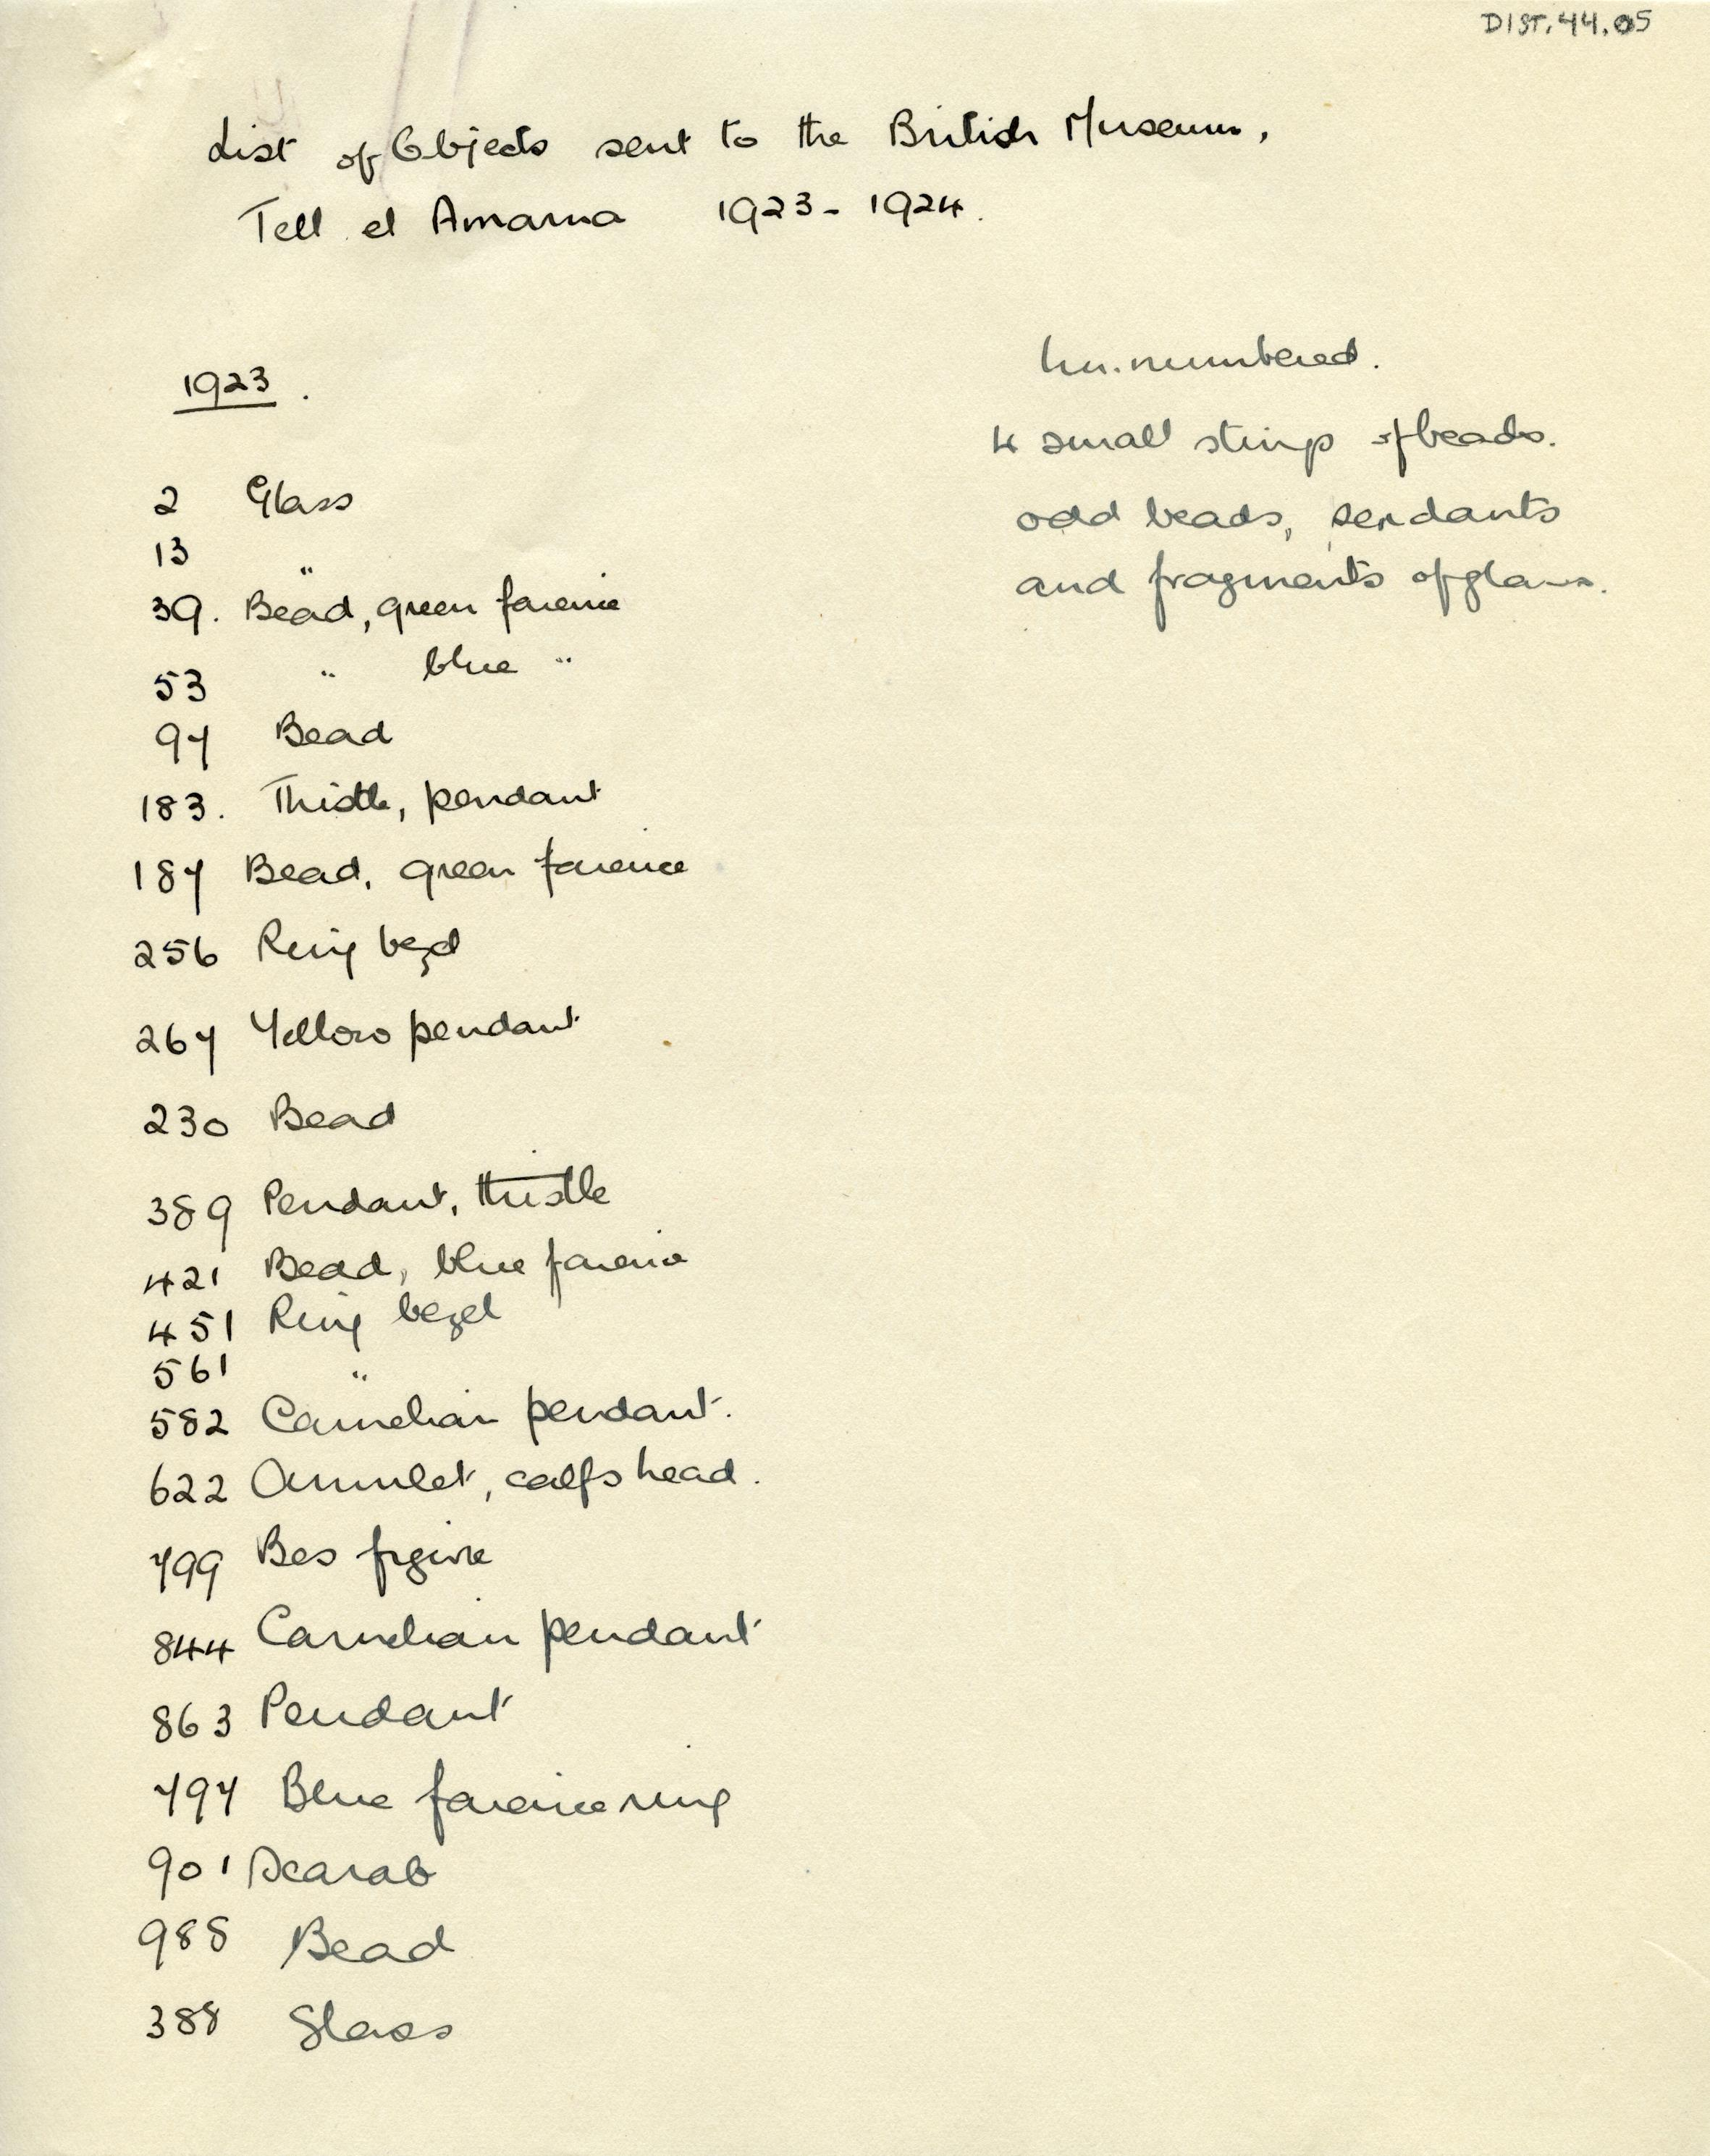 1923-25 el-Amarna DIST.44.05